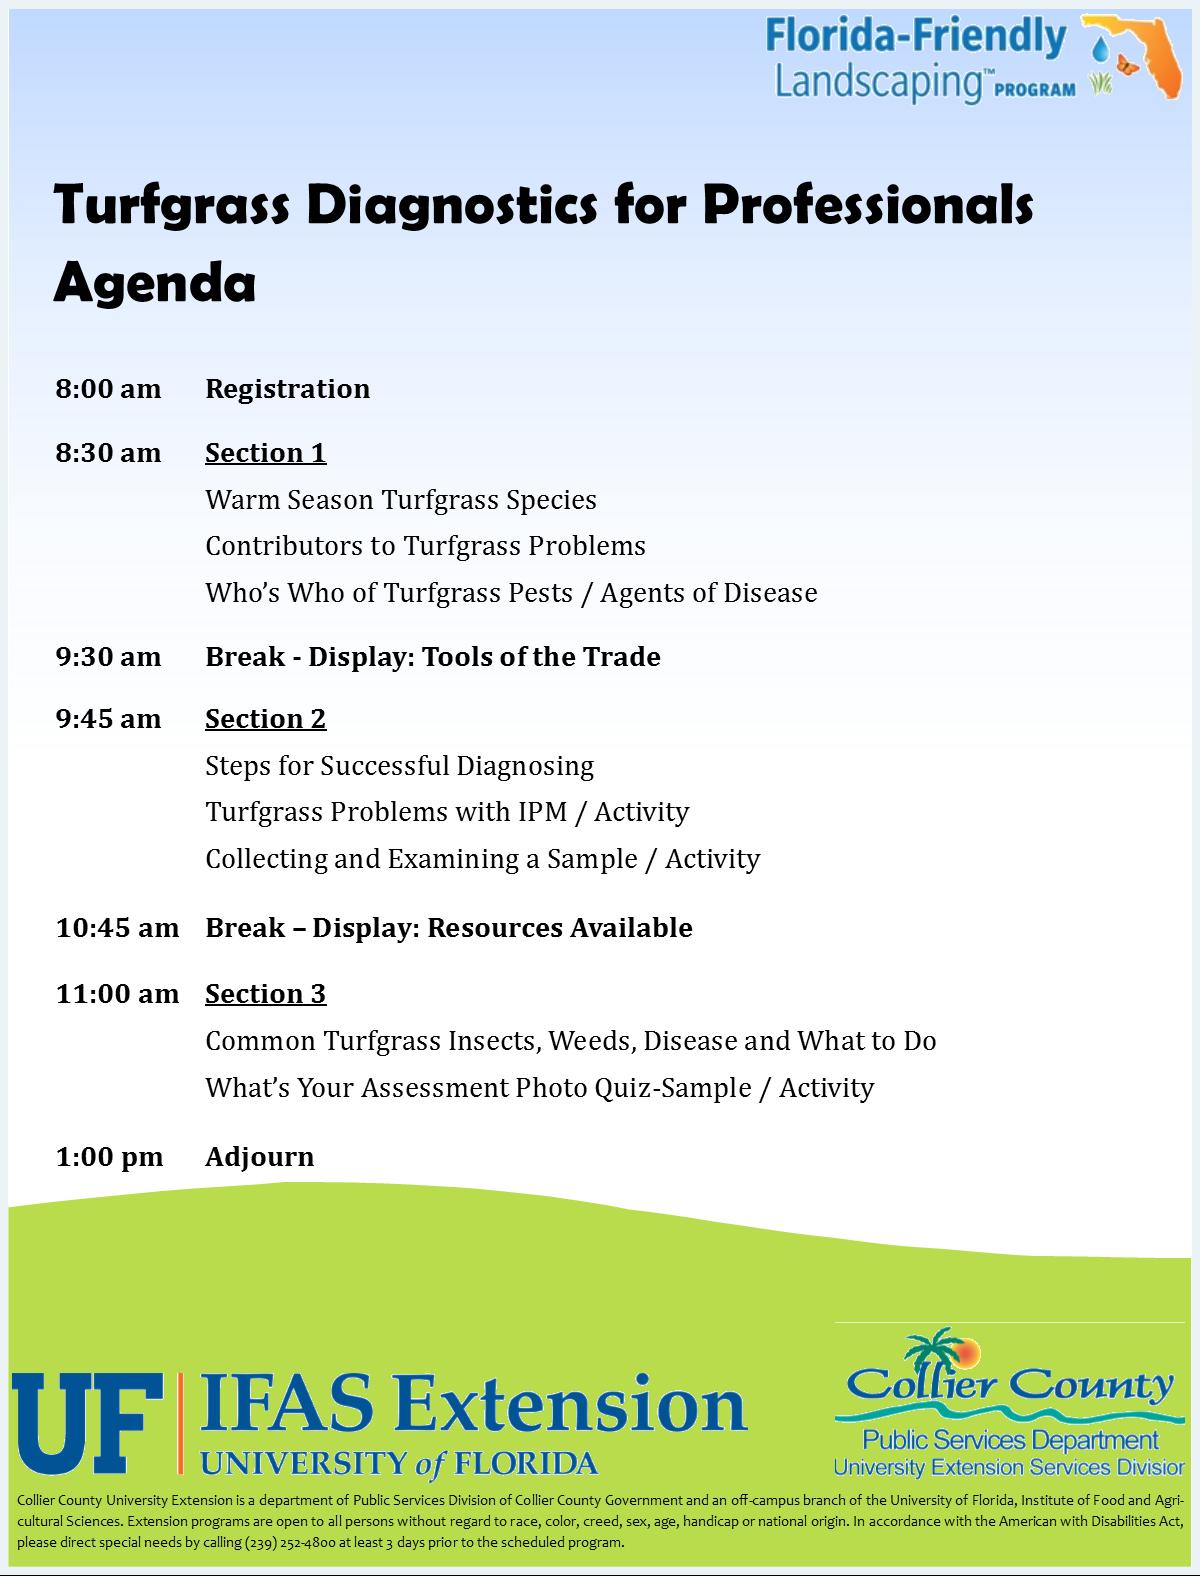 Turfgrass diagnostics agenda